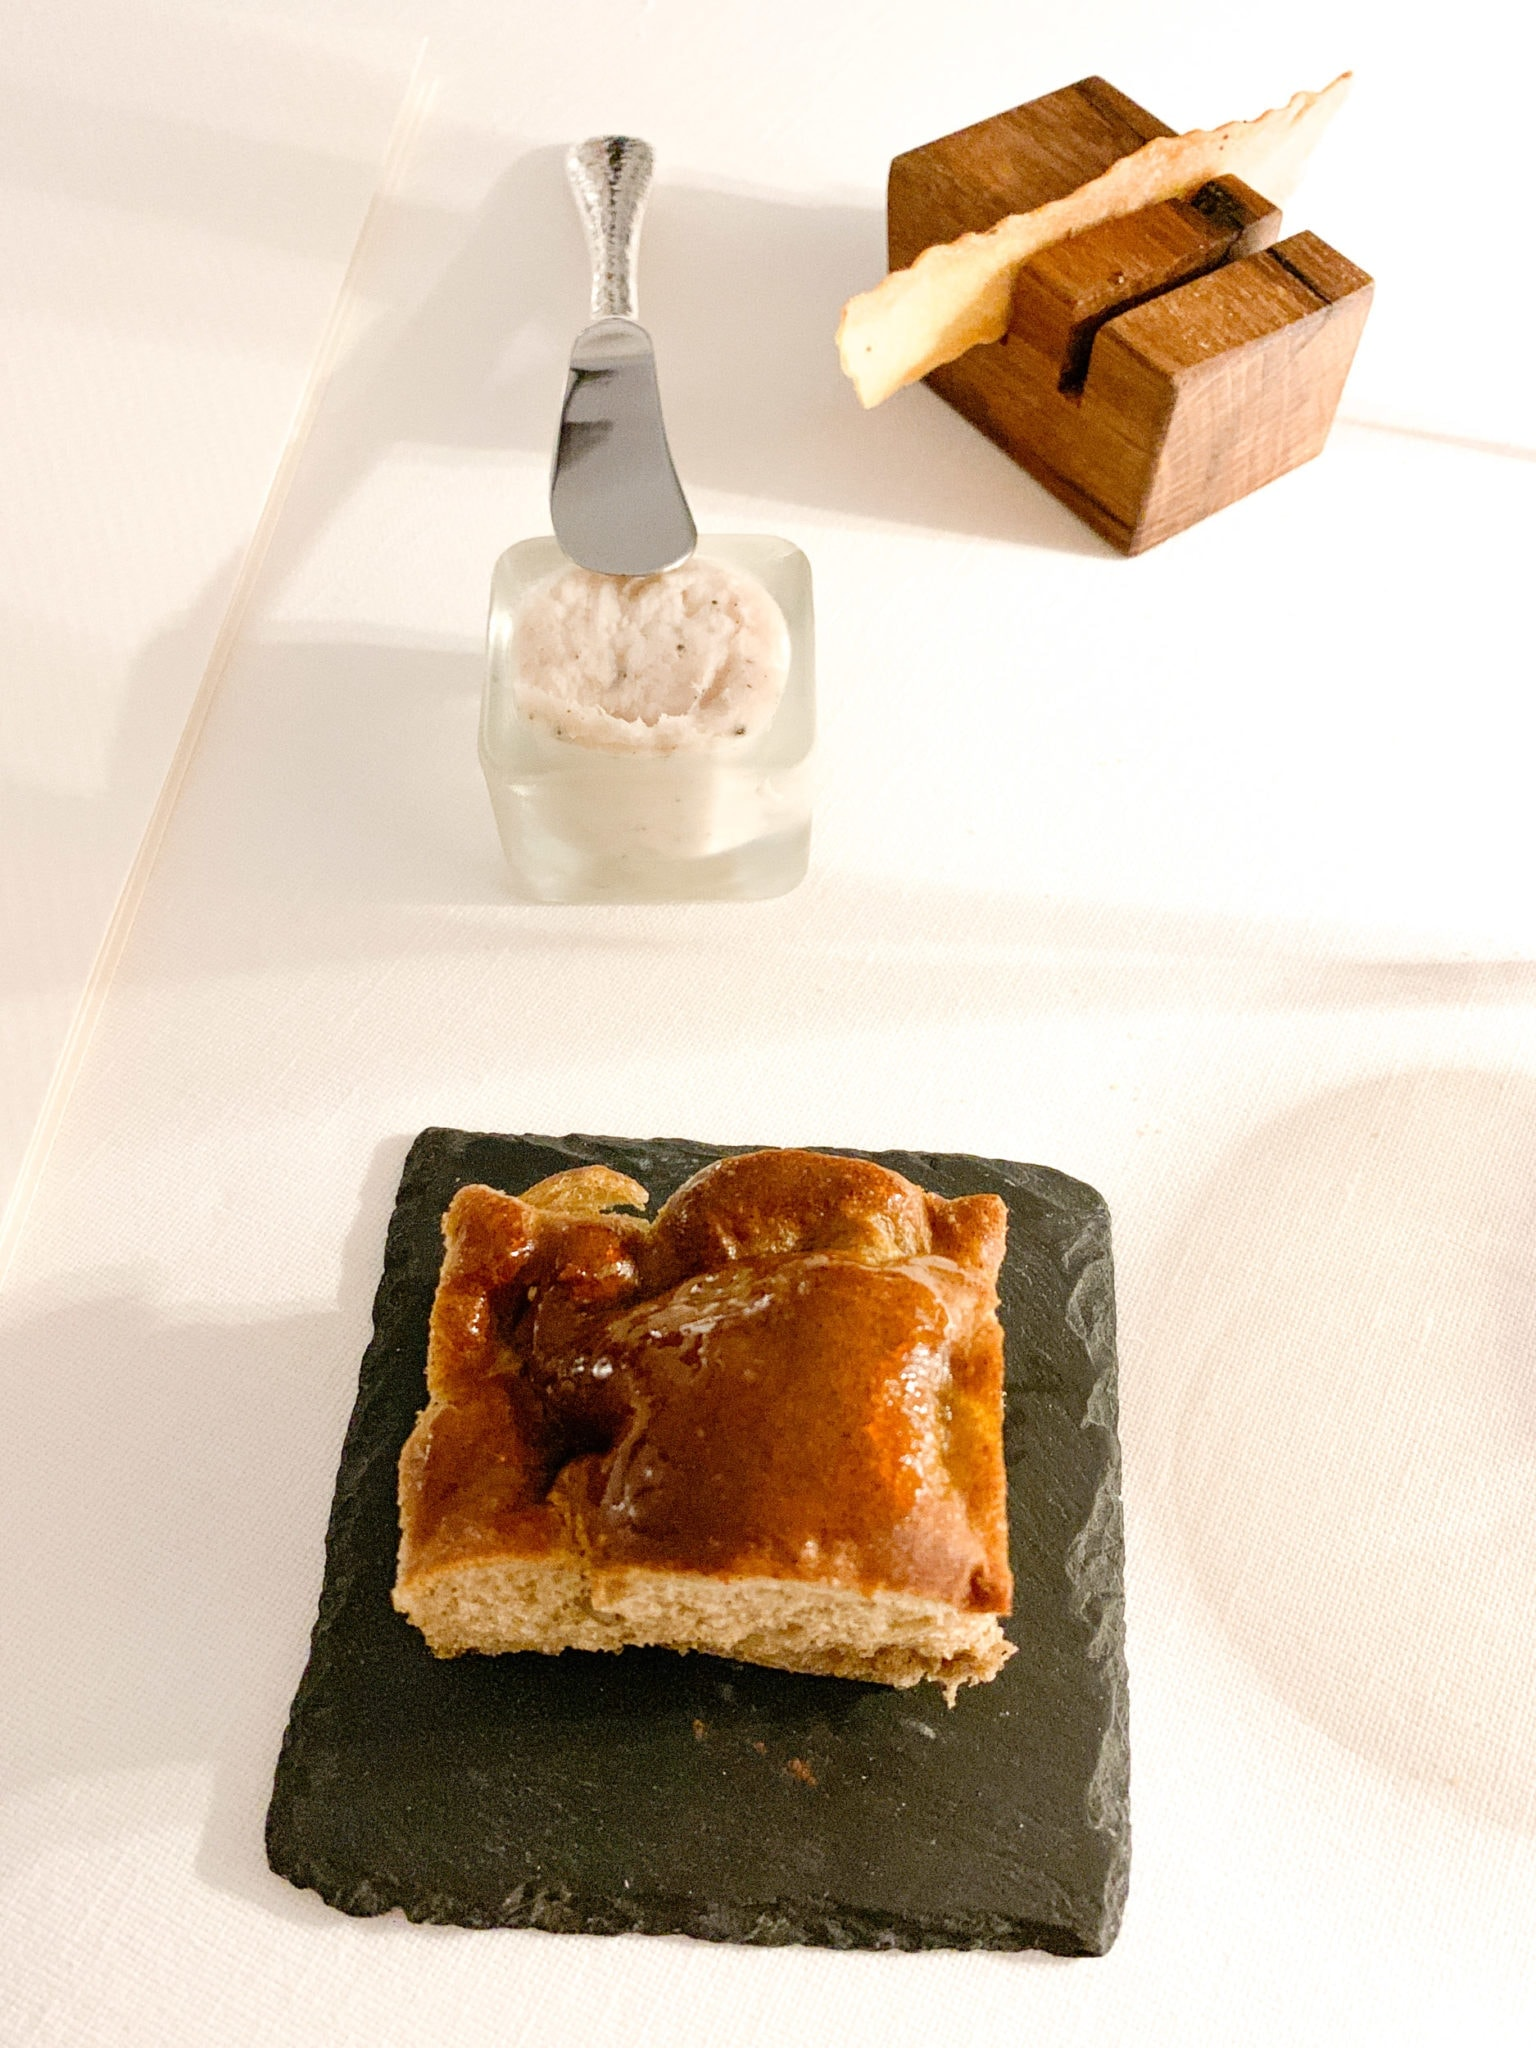 Focaccia with lard (pork fat)